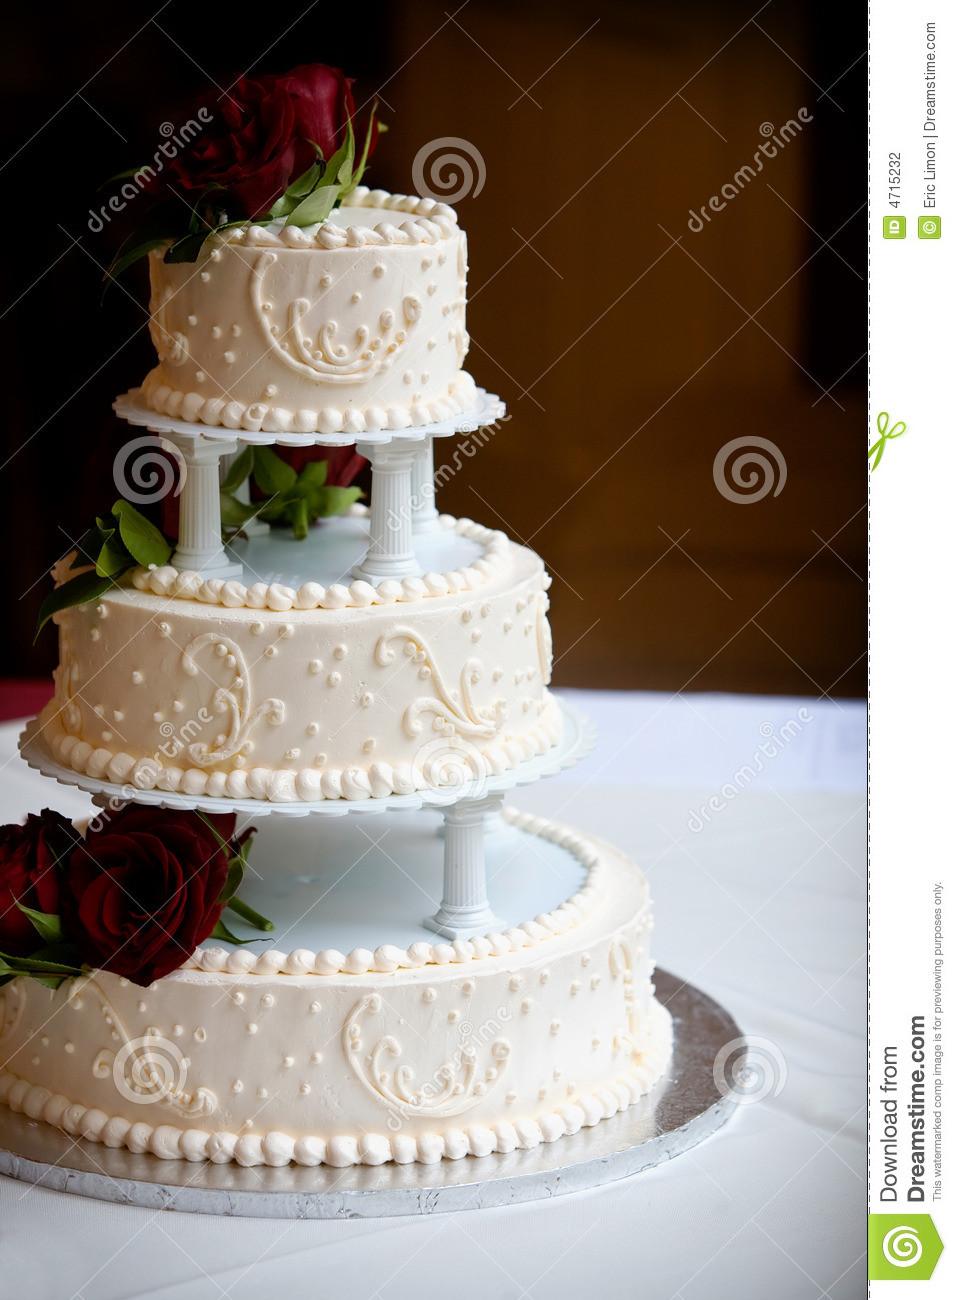 Tiered Wedding Cakes  Wedding Cake With Three Tiers Stock Image of